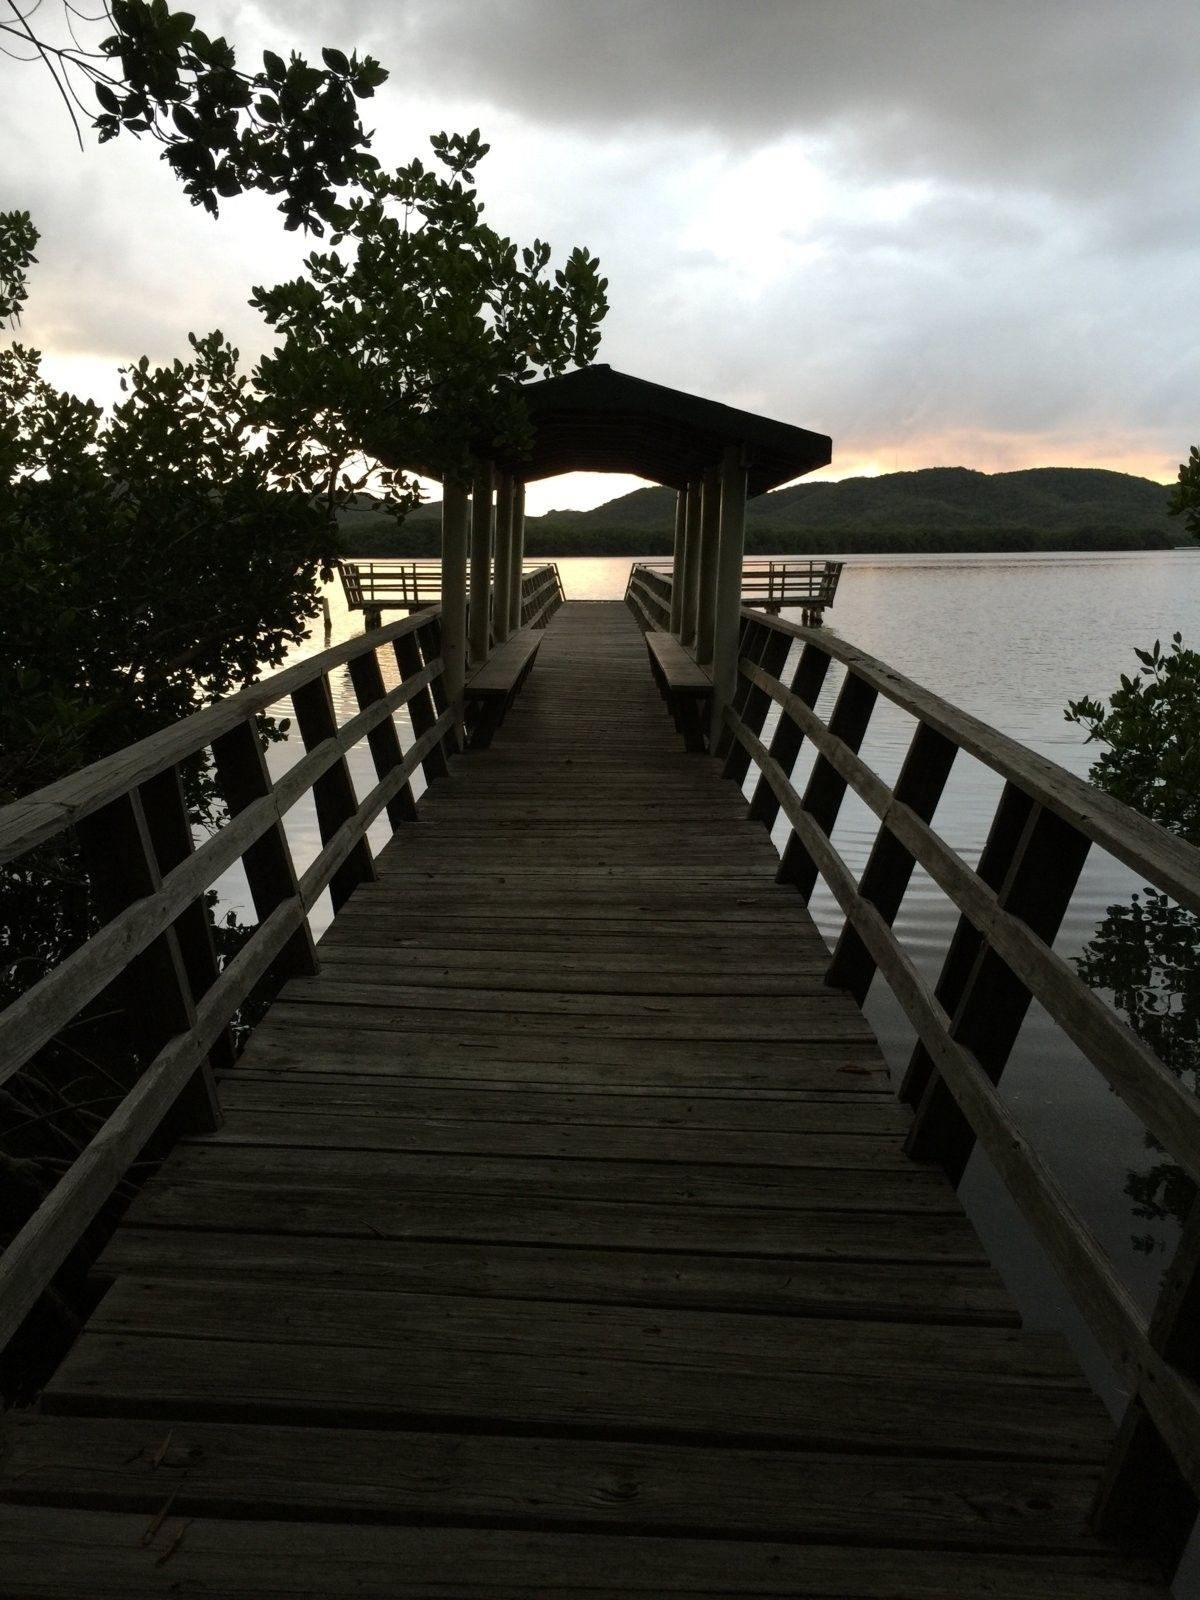 Hello from Puerto Rico - IMG_9272.jpg